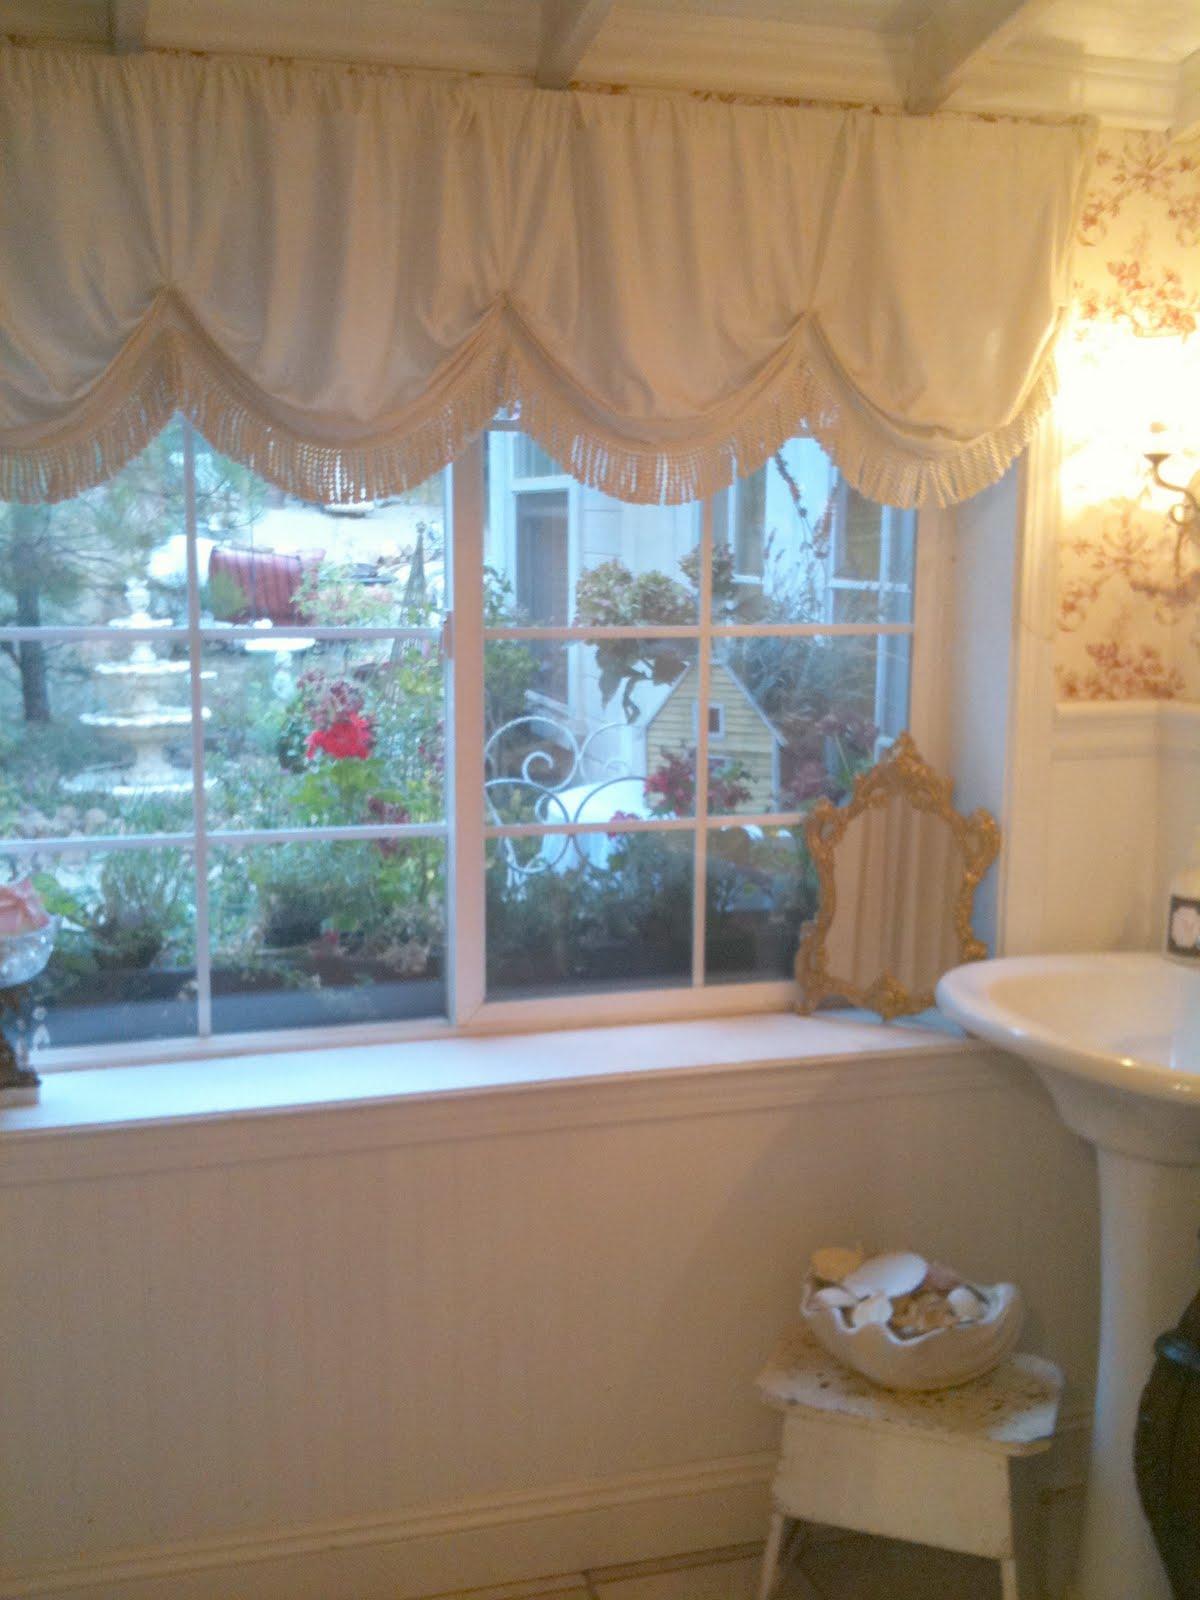 Bathroom Window Joe june softly ~ biker blog: ~~she came in through the bathroom